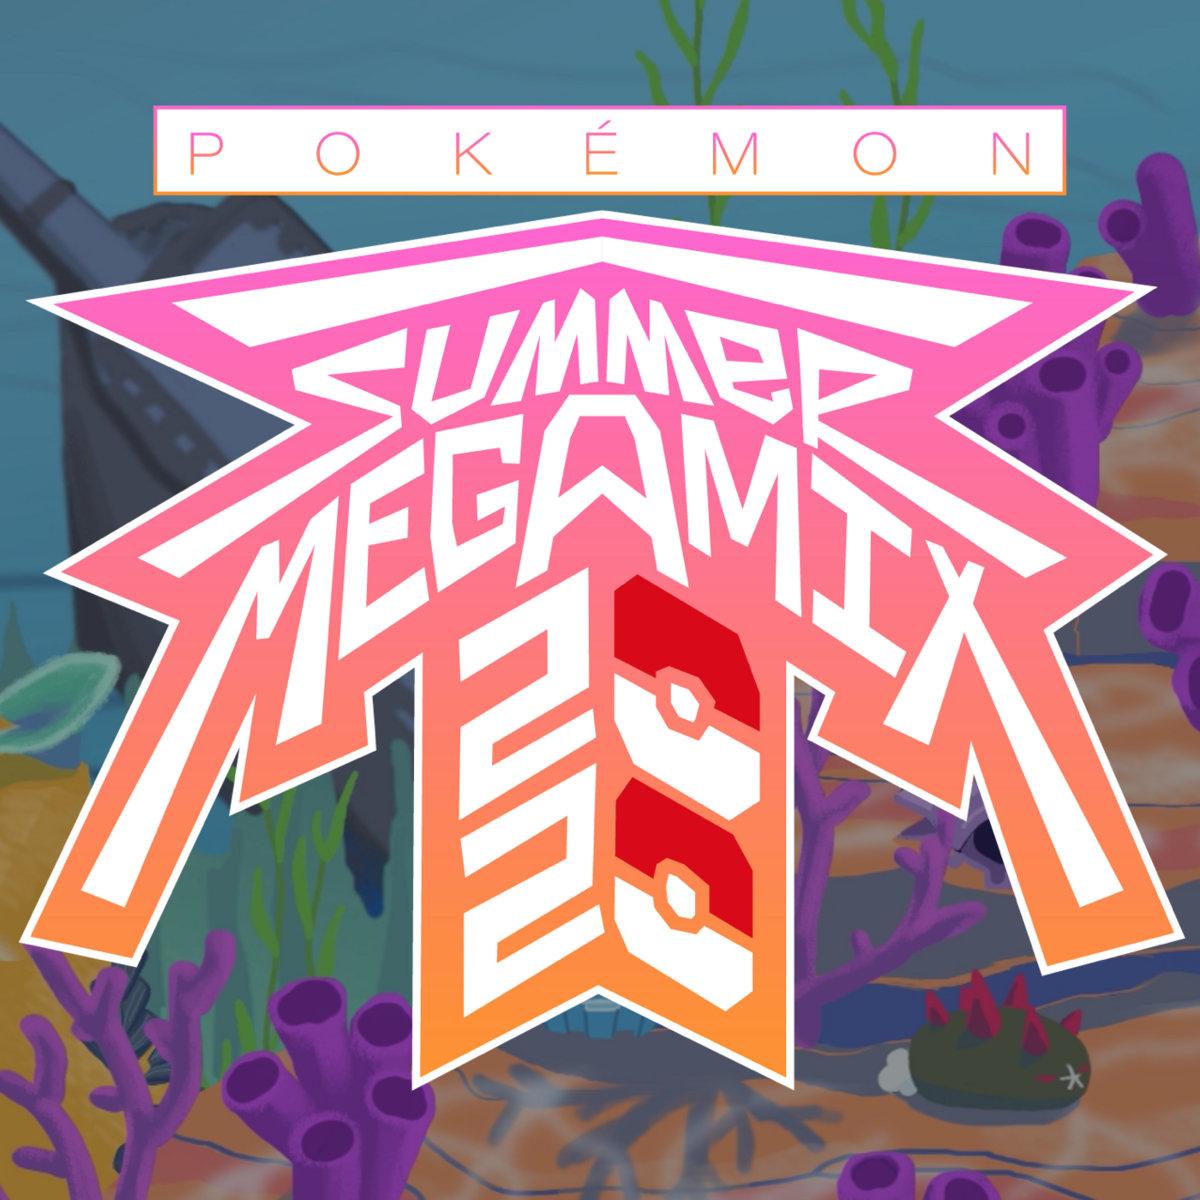 Pokemon Summer Megamix 2020 Poketube Megamix Original soundtrack composed by hitomi sato for pokemon black and white. pokemon summer megamix 2020 poketube